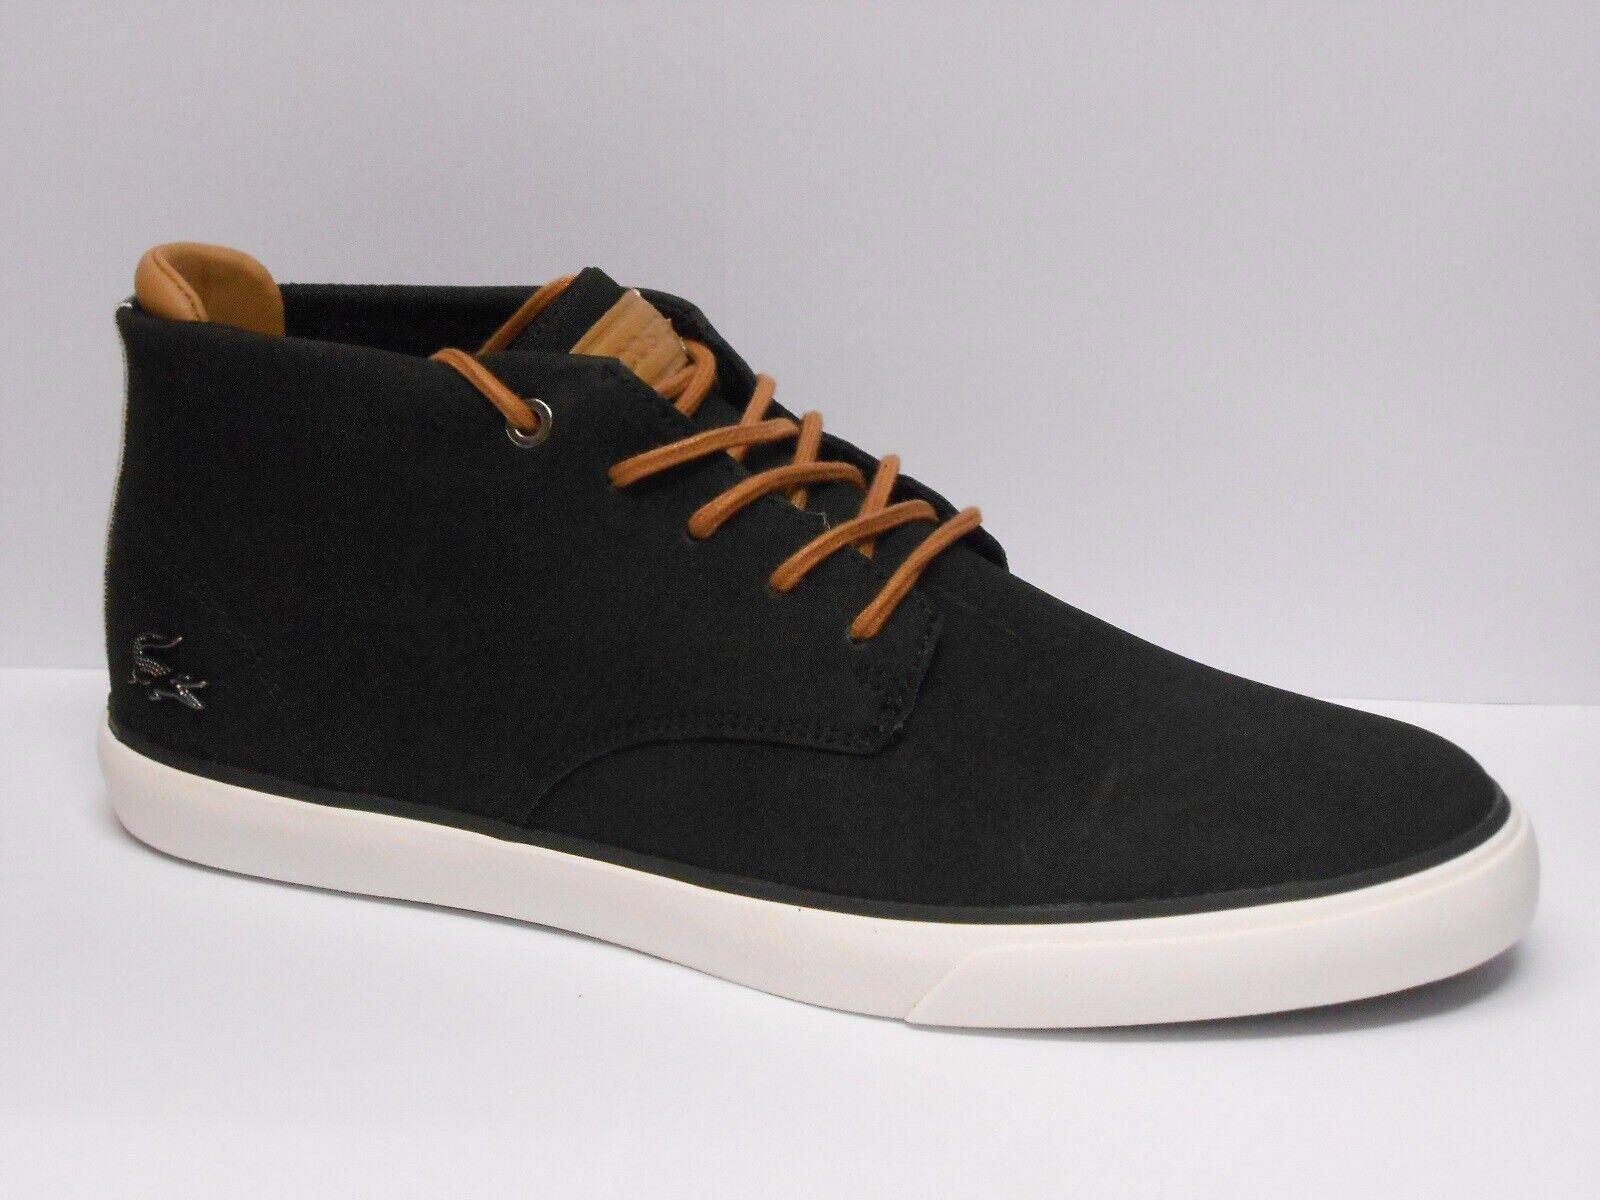 Lacoste Esparre Chukka 118 1 Cam Schwarze Herren UK Größe 6,5 Schuhe